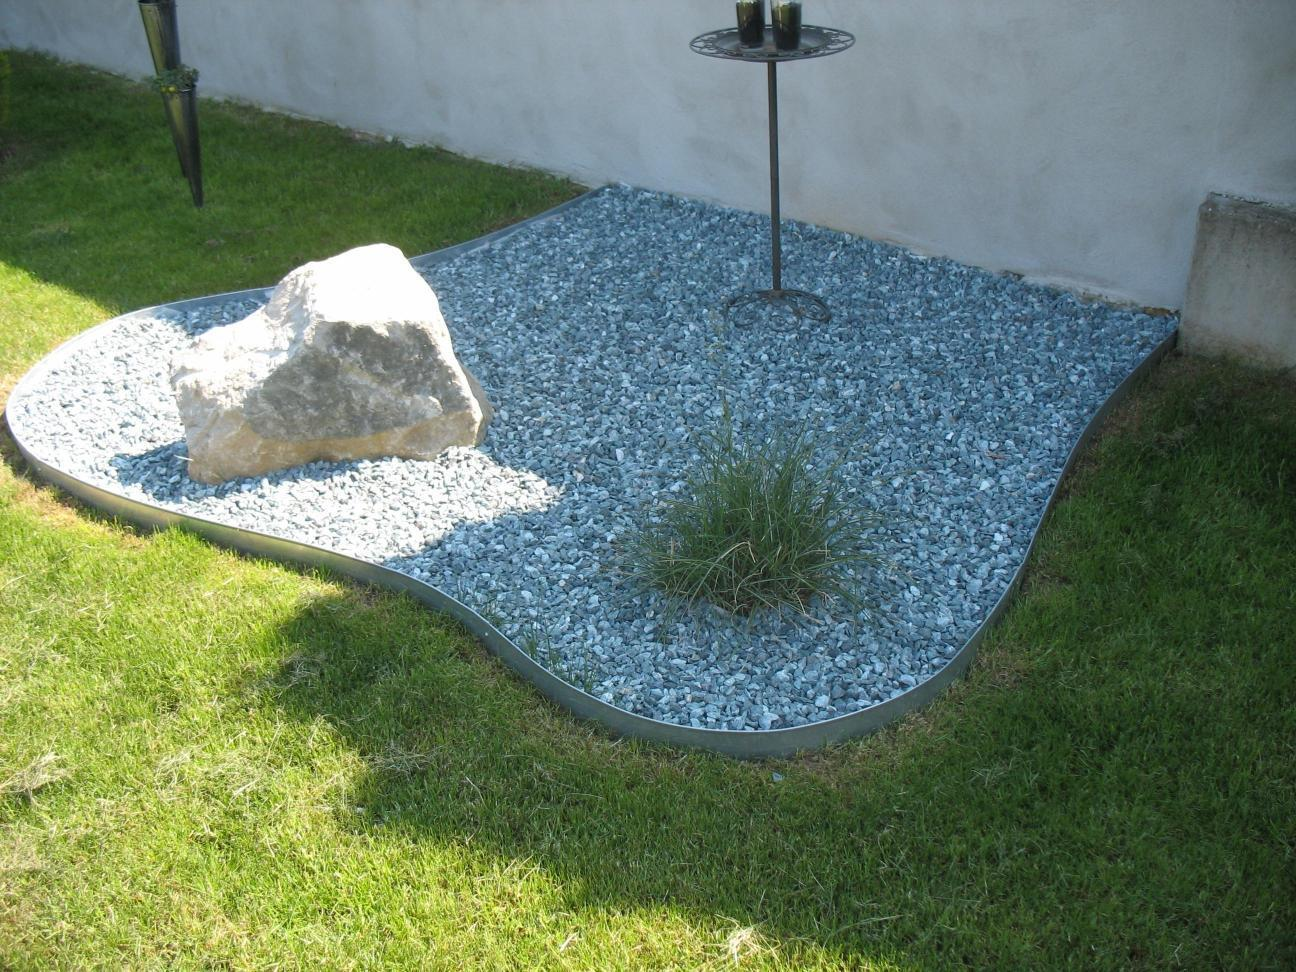 rasenkanten metall 118 cm x 17 5 cm x 0 95 mm im 1 er set und 1 18m l nge. Black Bedroom Furniture Sets. Home Design Ideas